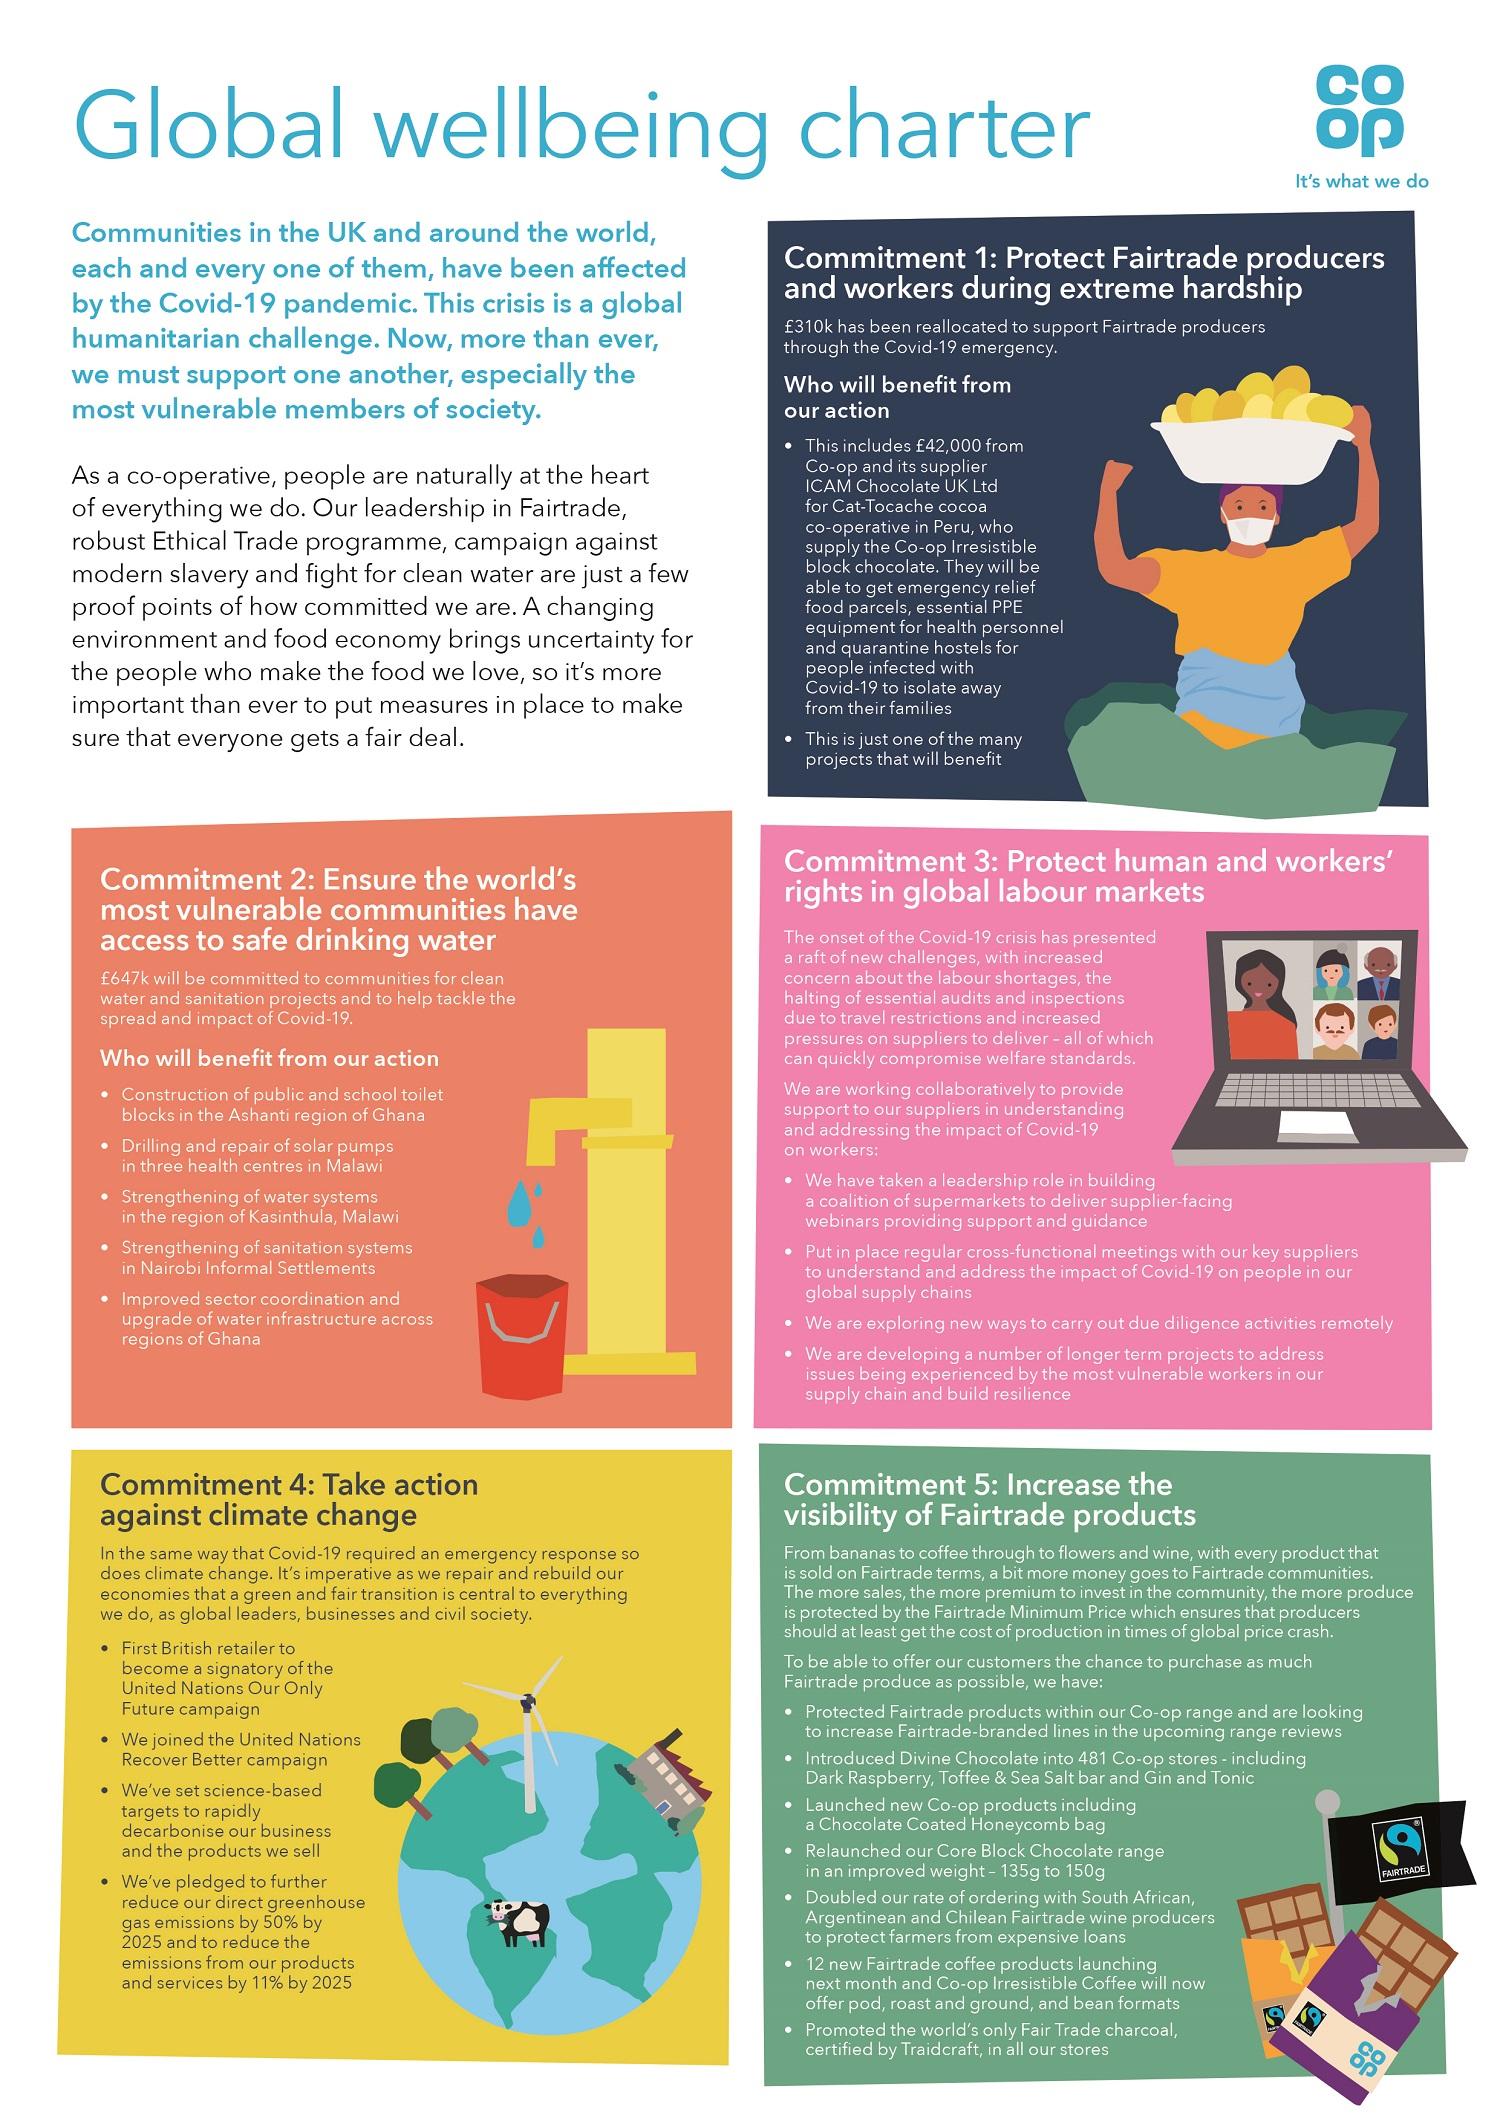 Co-op global wellbeing charter